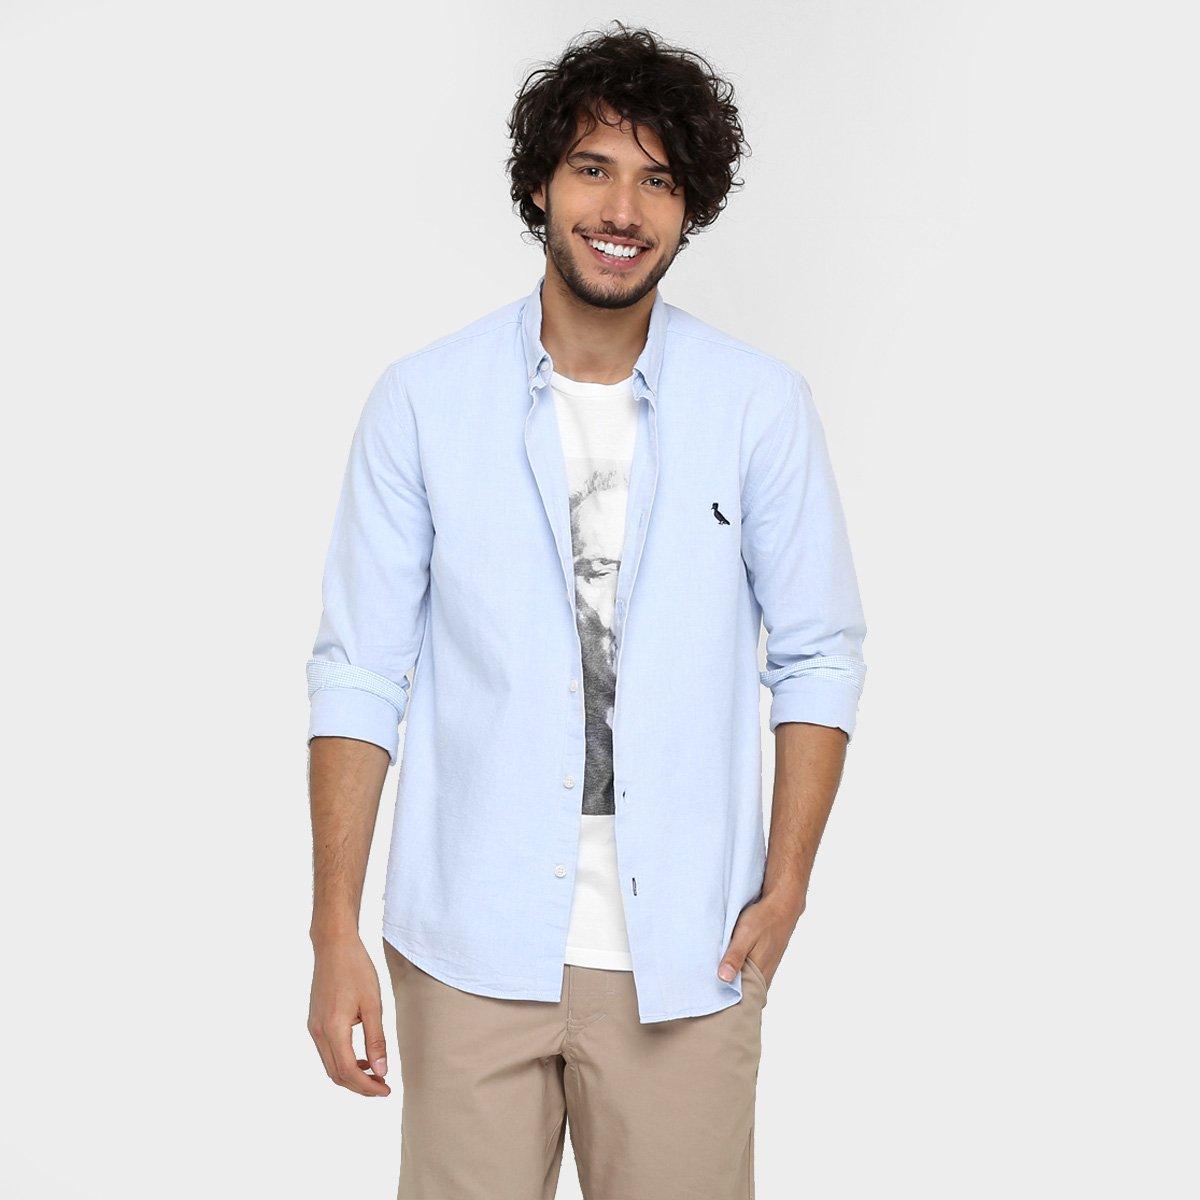 camisas Reserva ML regular bordado logo 3574